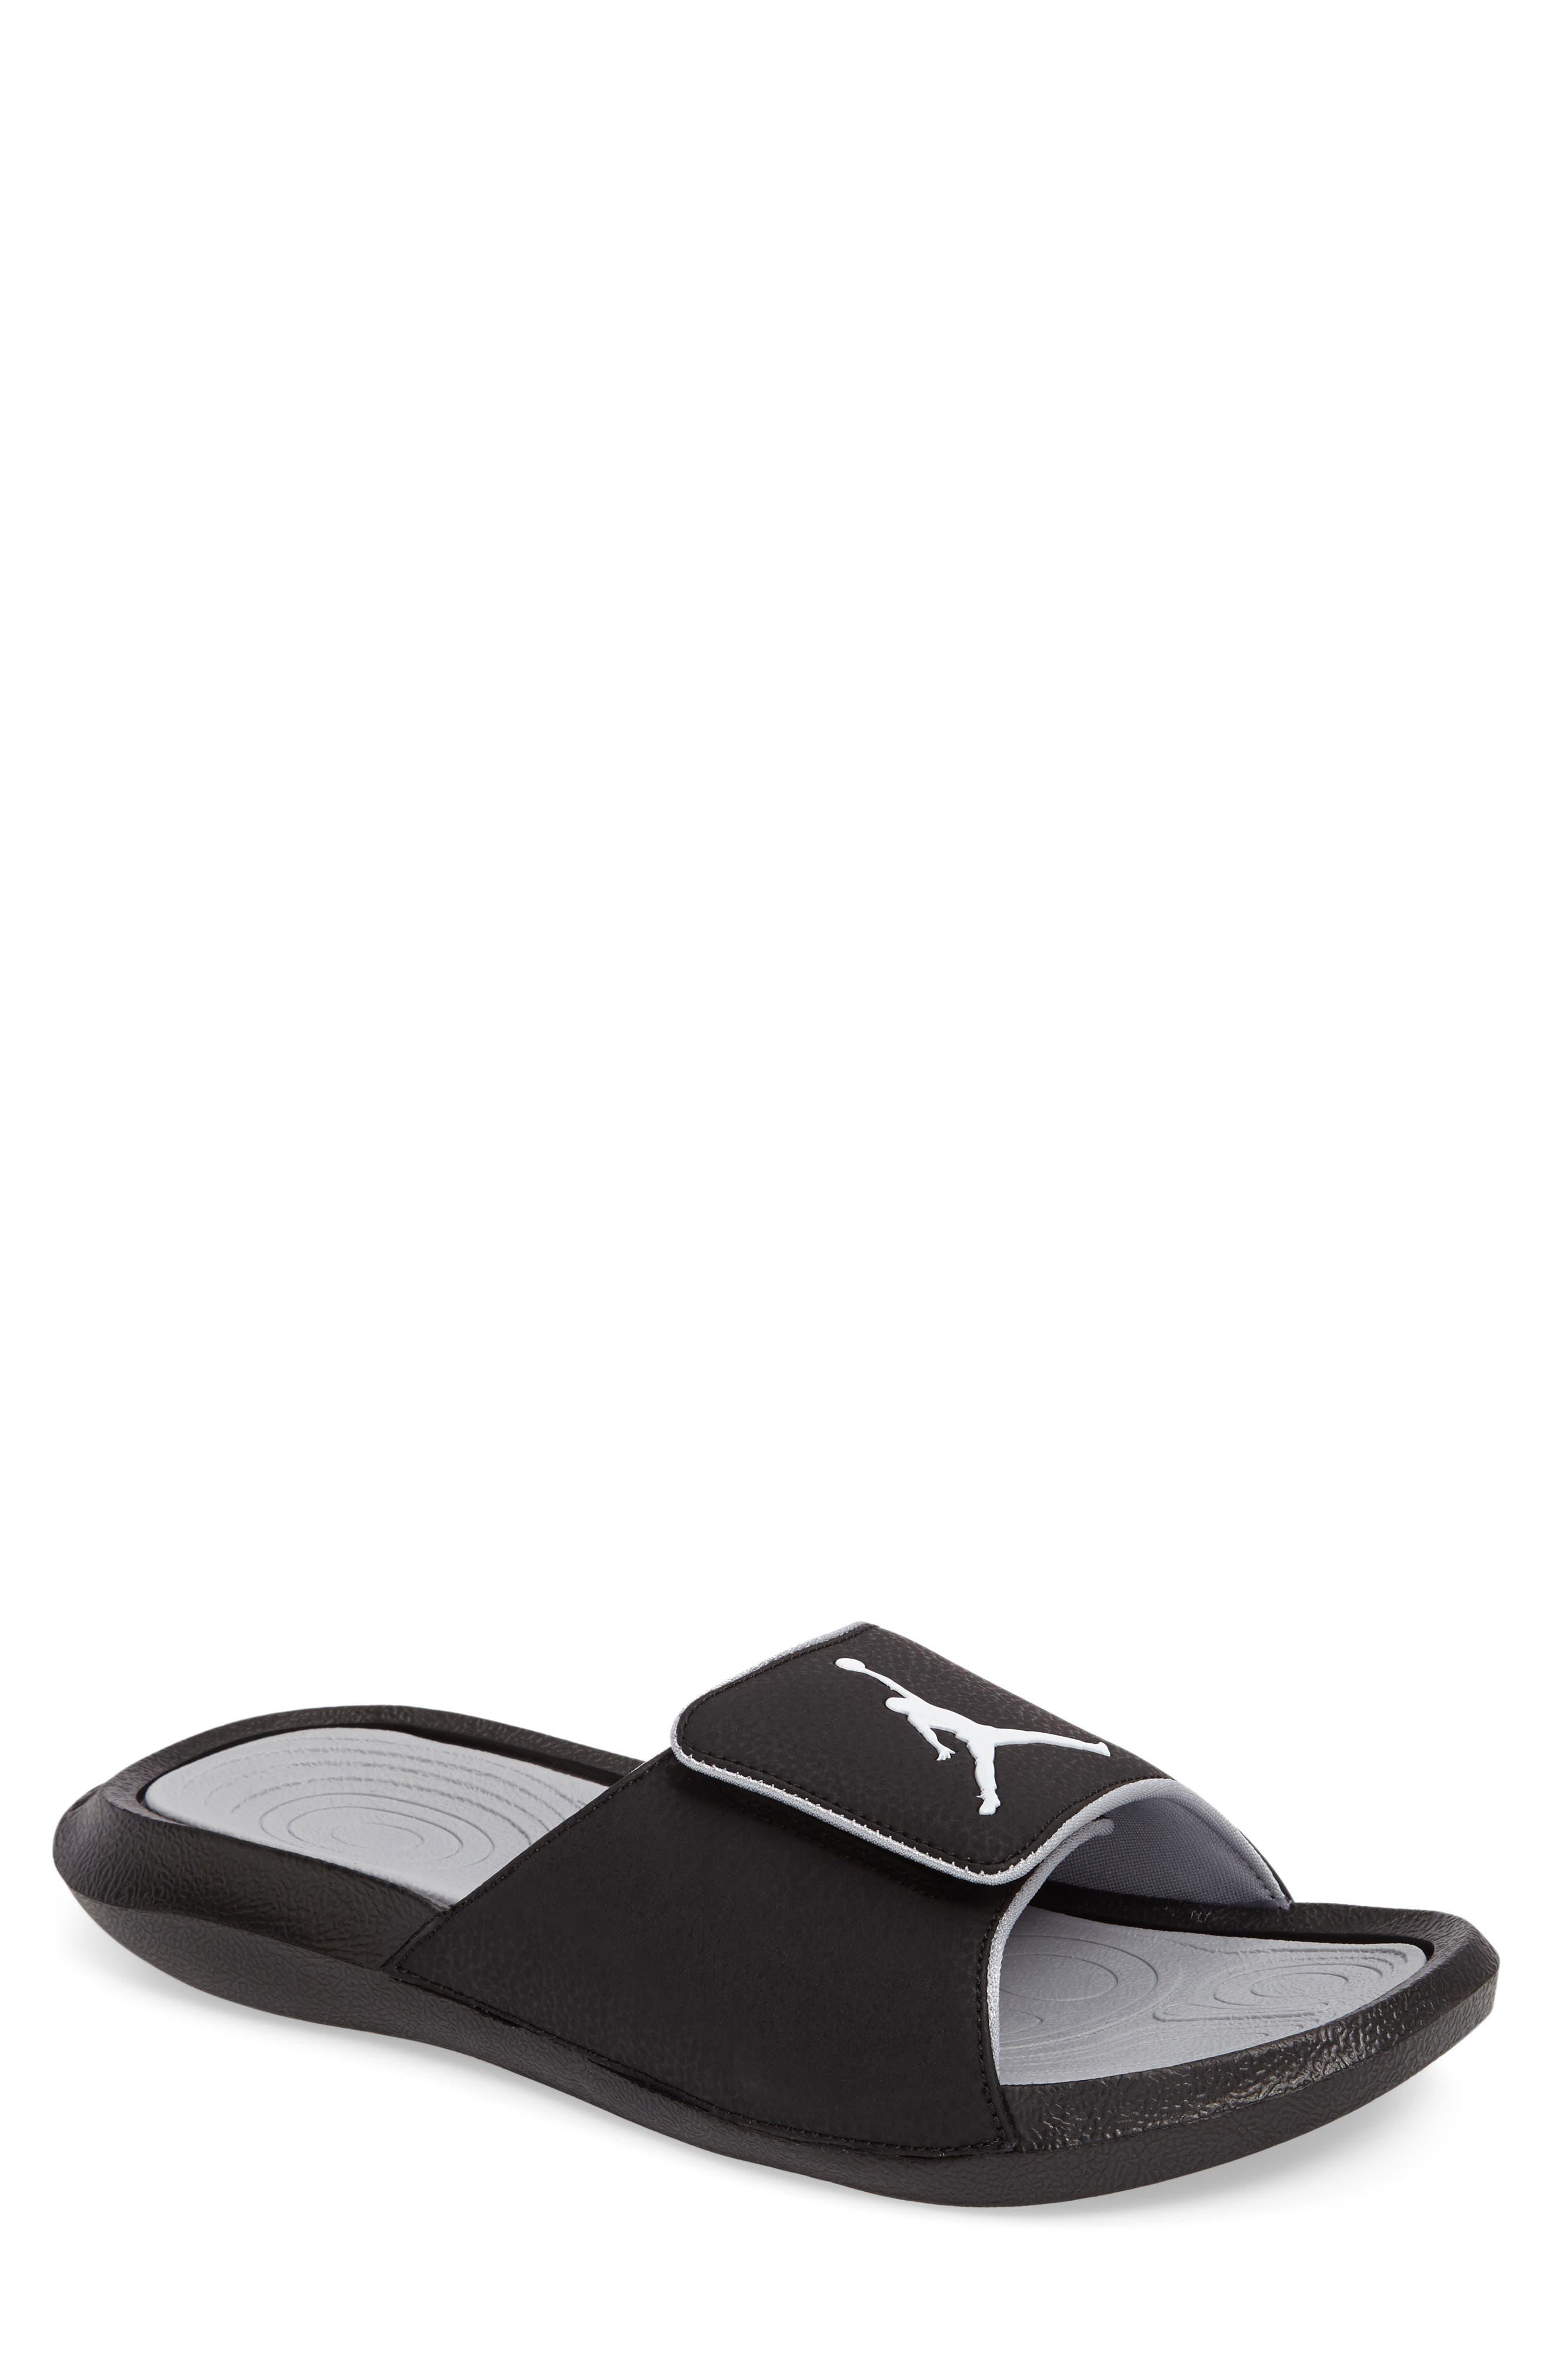 NIKE Jordan Hydro 6 Slide Sandal, Main, color, 011